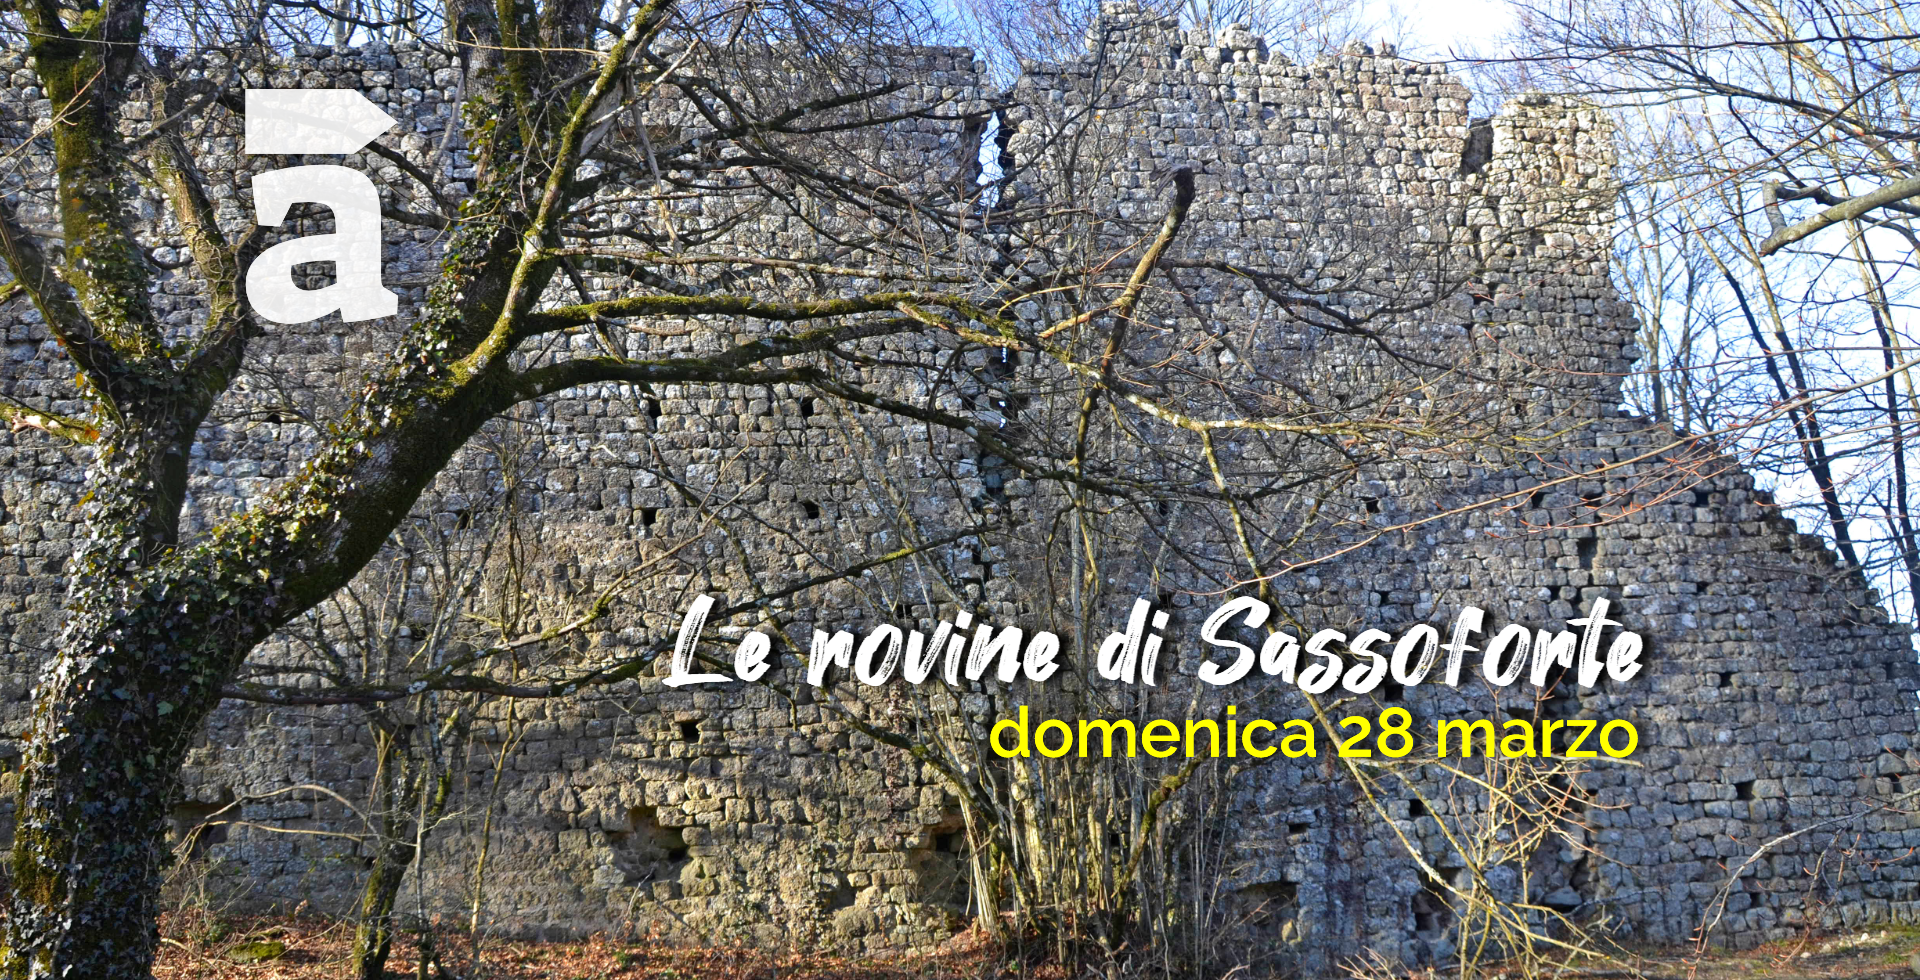 Rovine_Sassoforte_2021.png